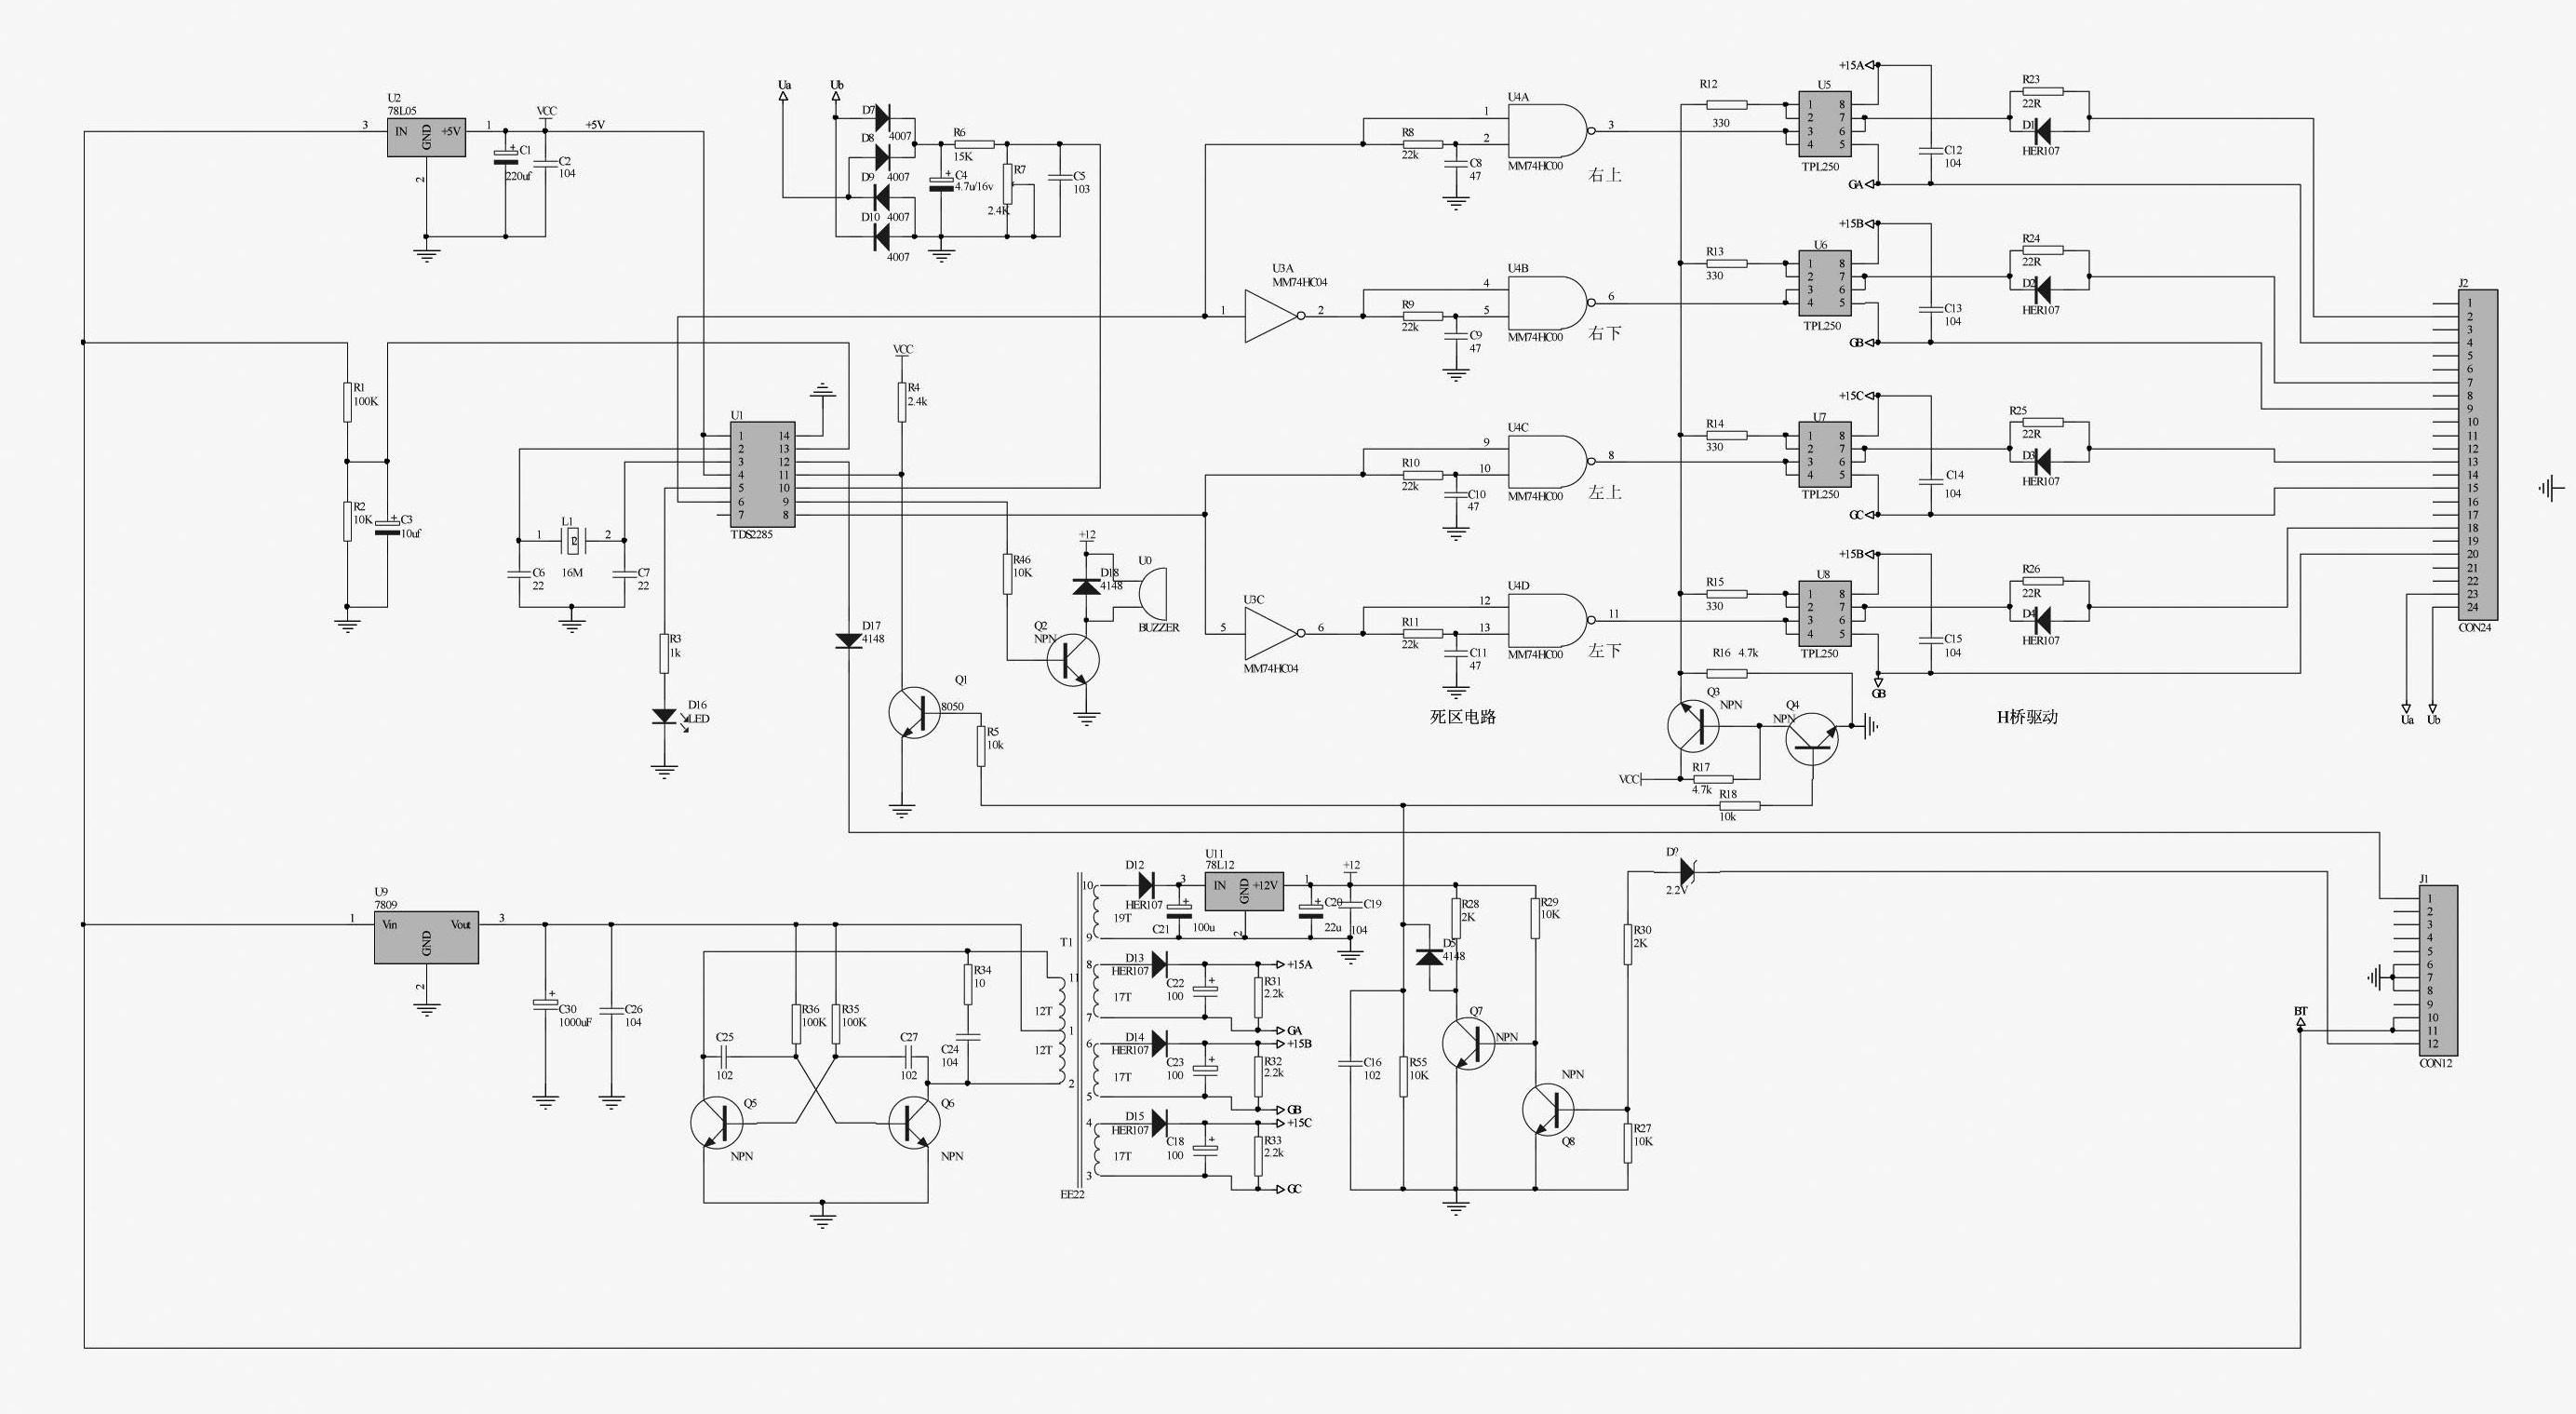 Car inverter circuit diagram getting started with littlebits sanea inverter wiring diagram of car inverter circuit